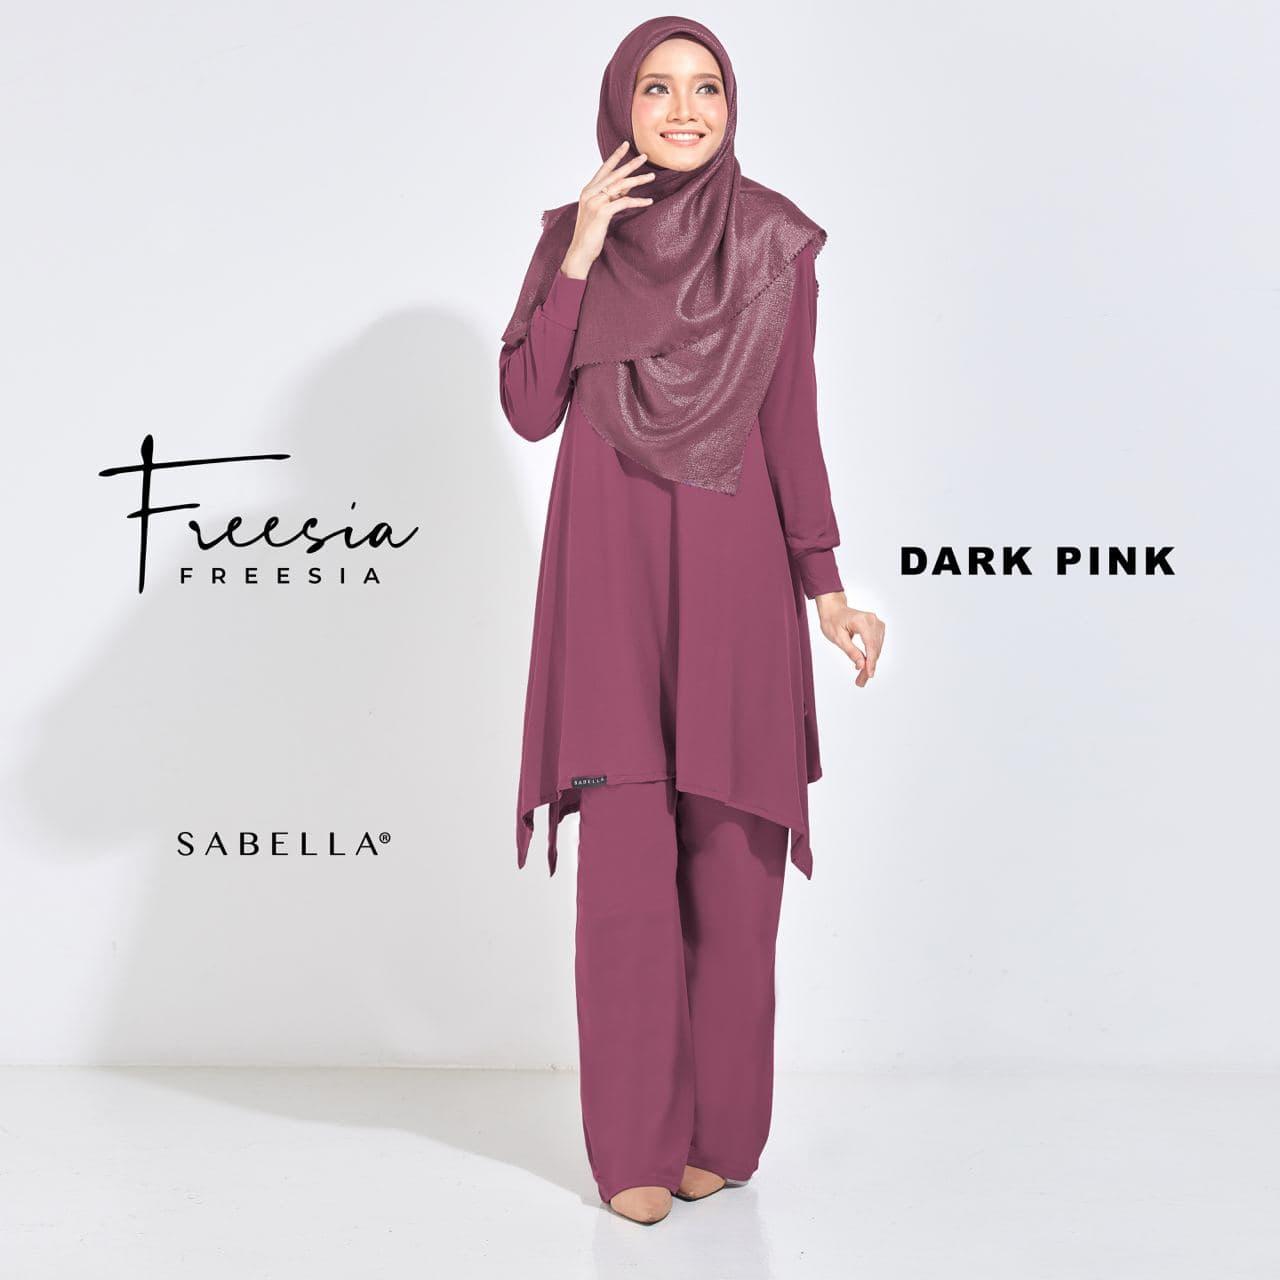 Freesia Dark Pink